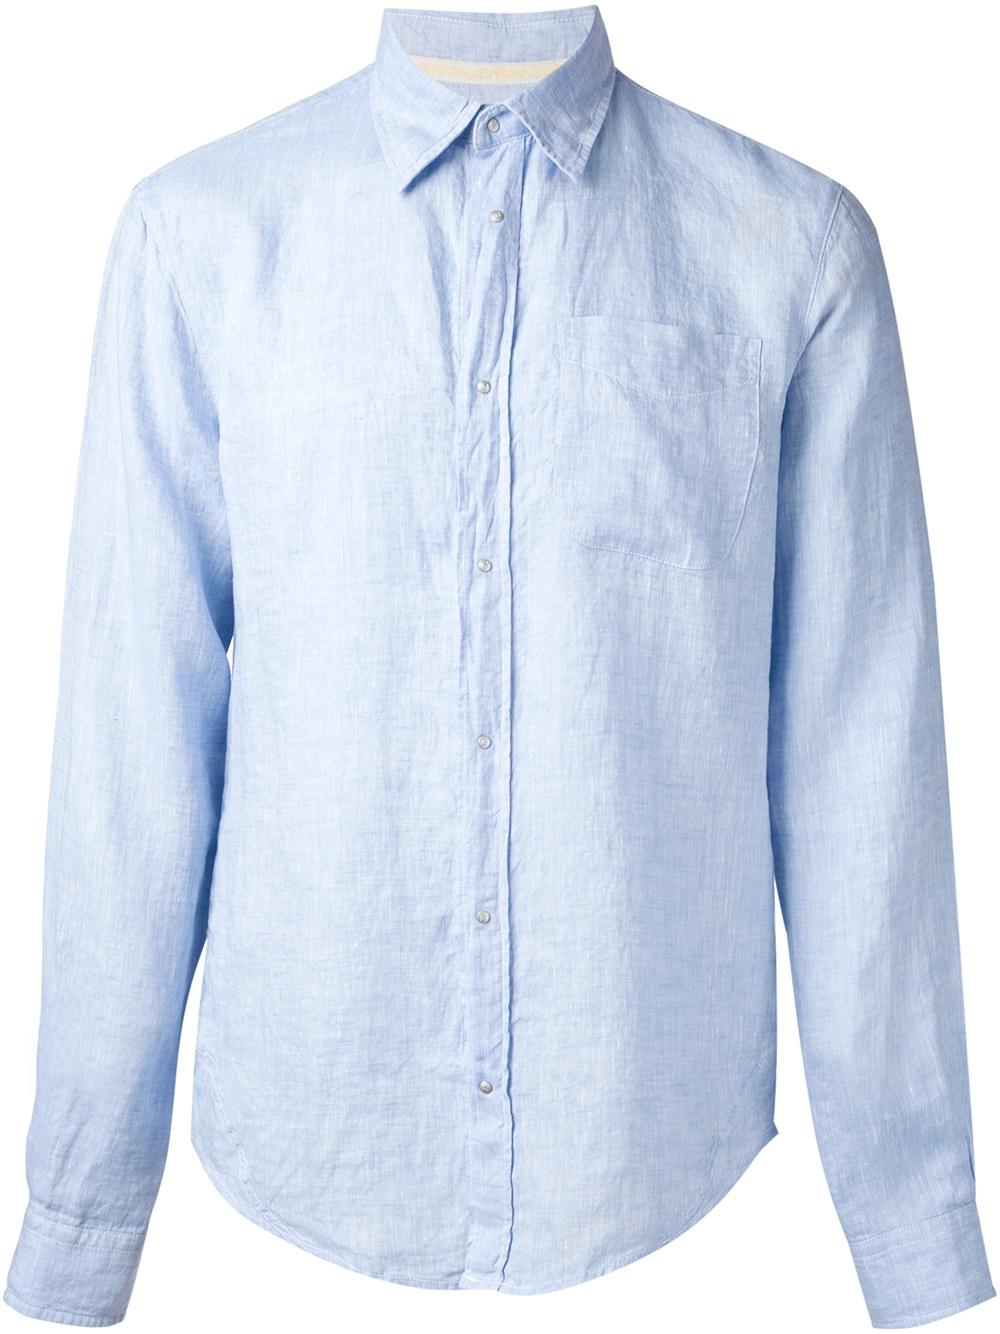 Armani Jeans Press Stud Fastening Shirt In Blue For Men Lyst